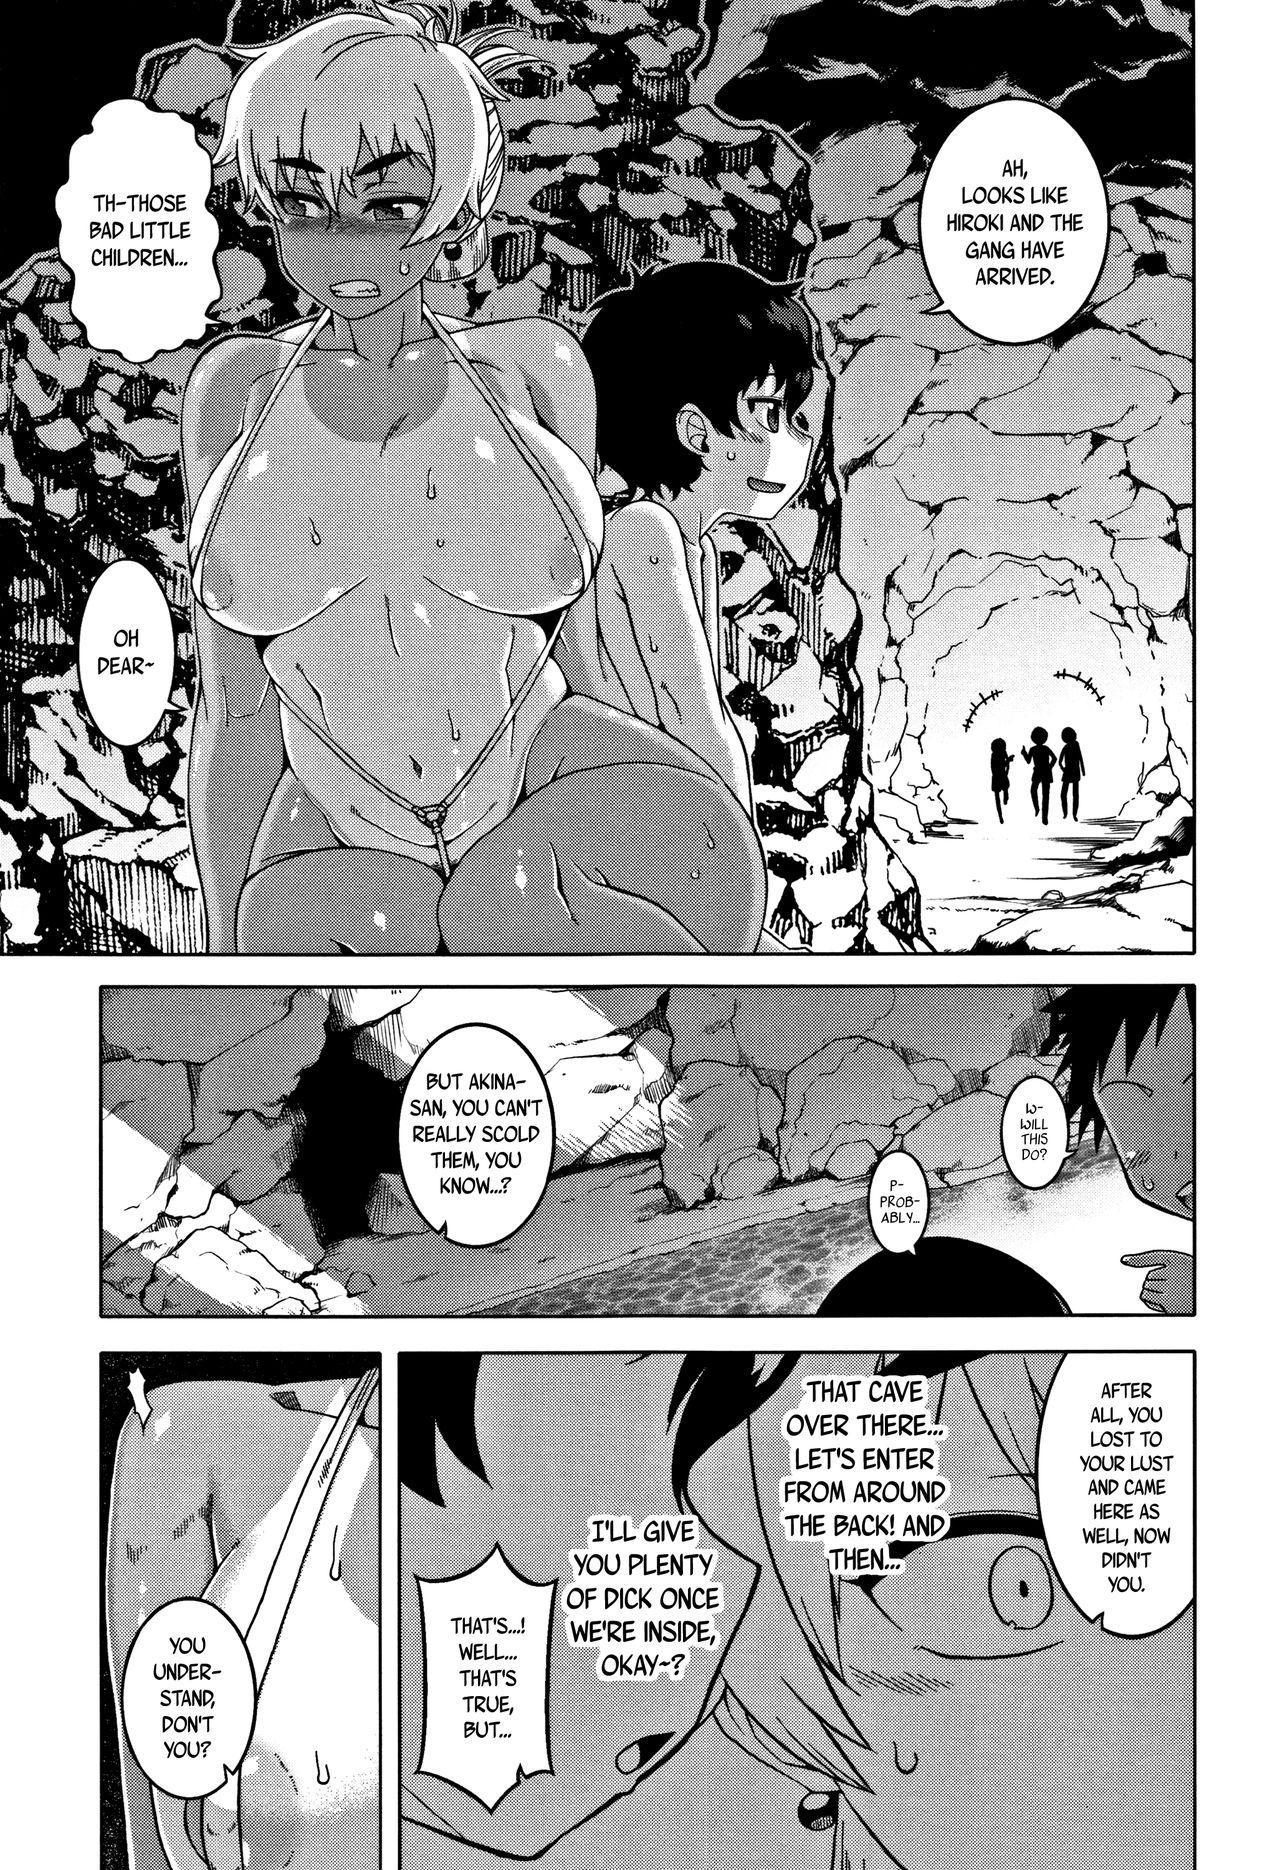 [Takatsu] Hitozuma A-san to Musuko no Yuujin N-kun - Married wife A and son's friend N-kun Ch. 1-3 [English] 59